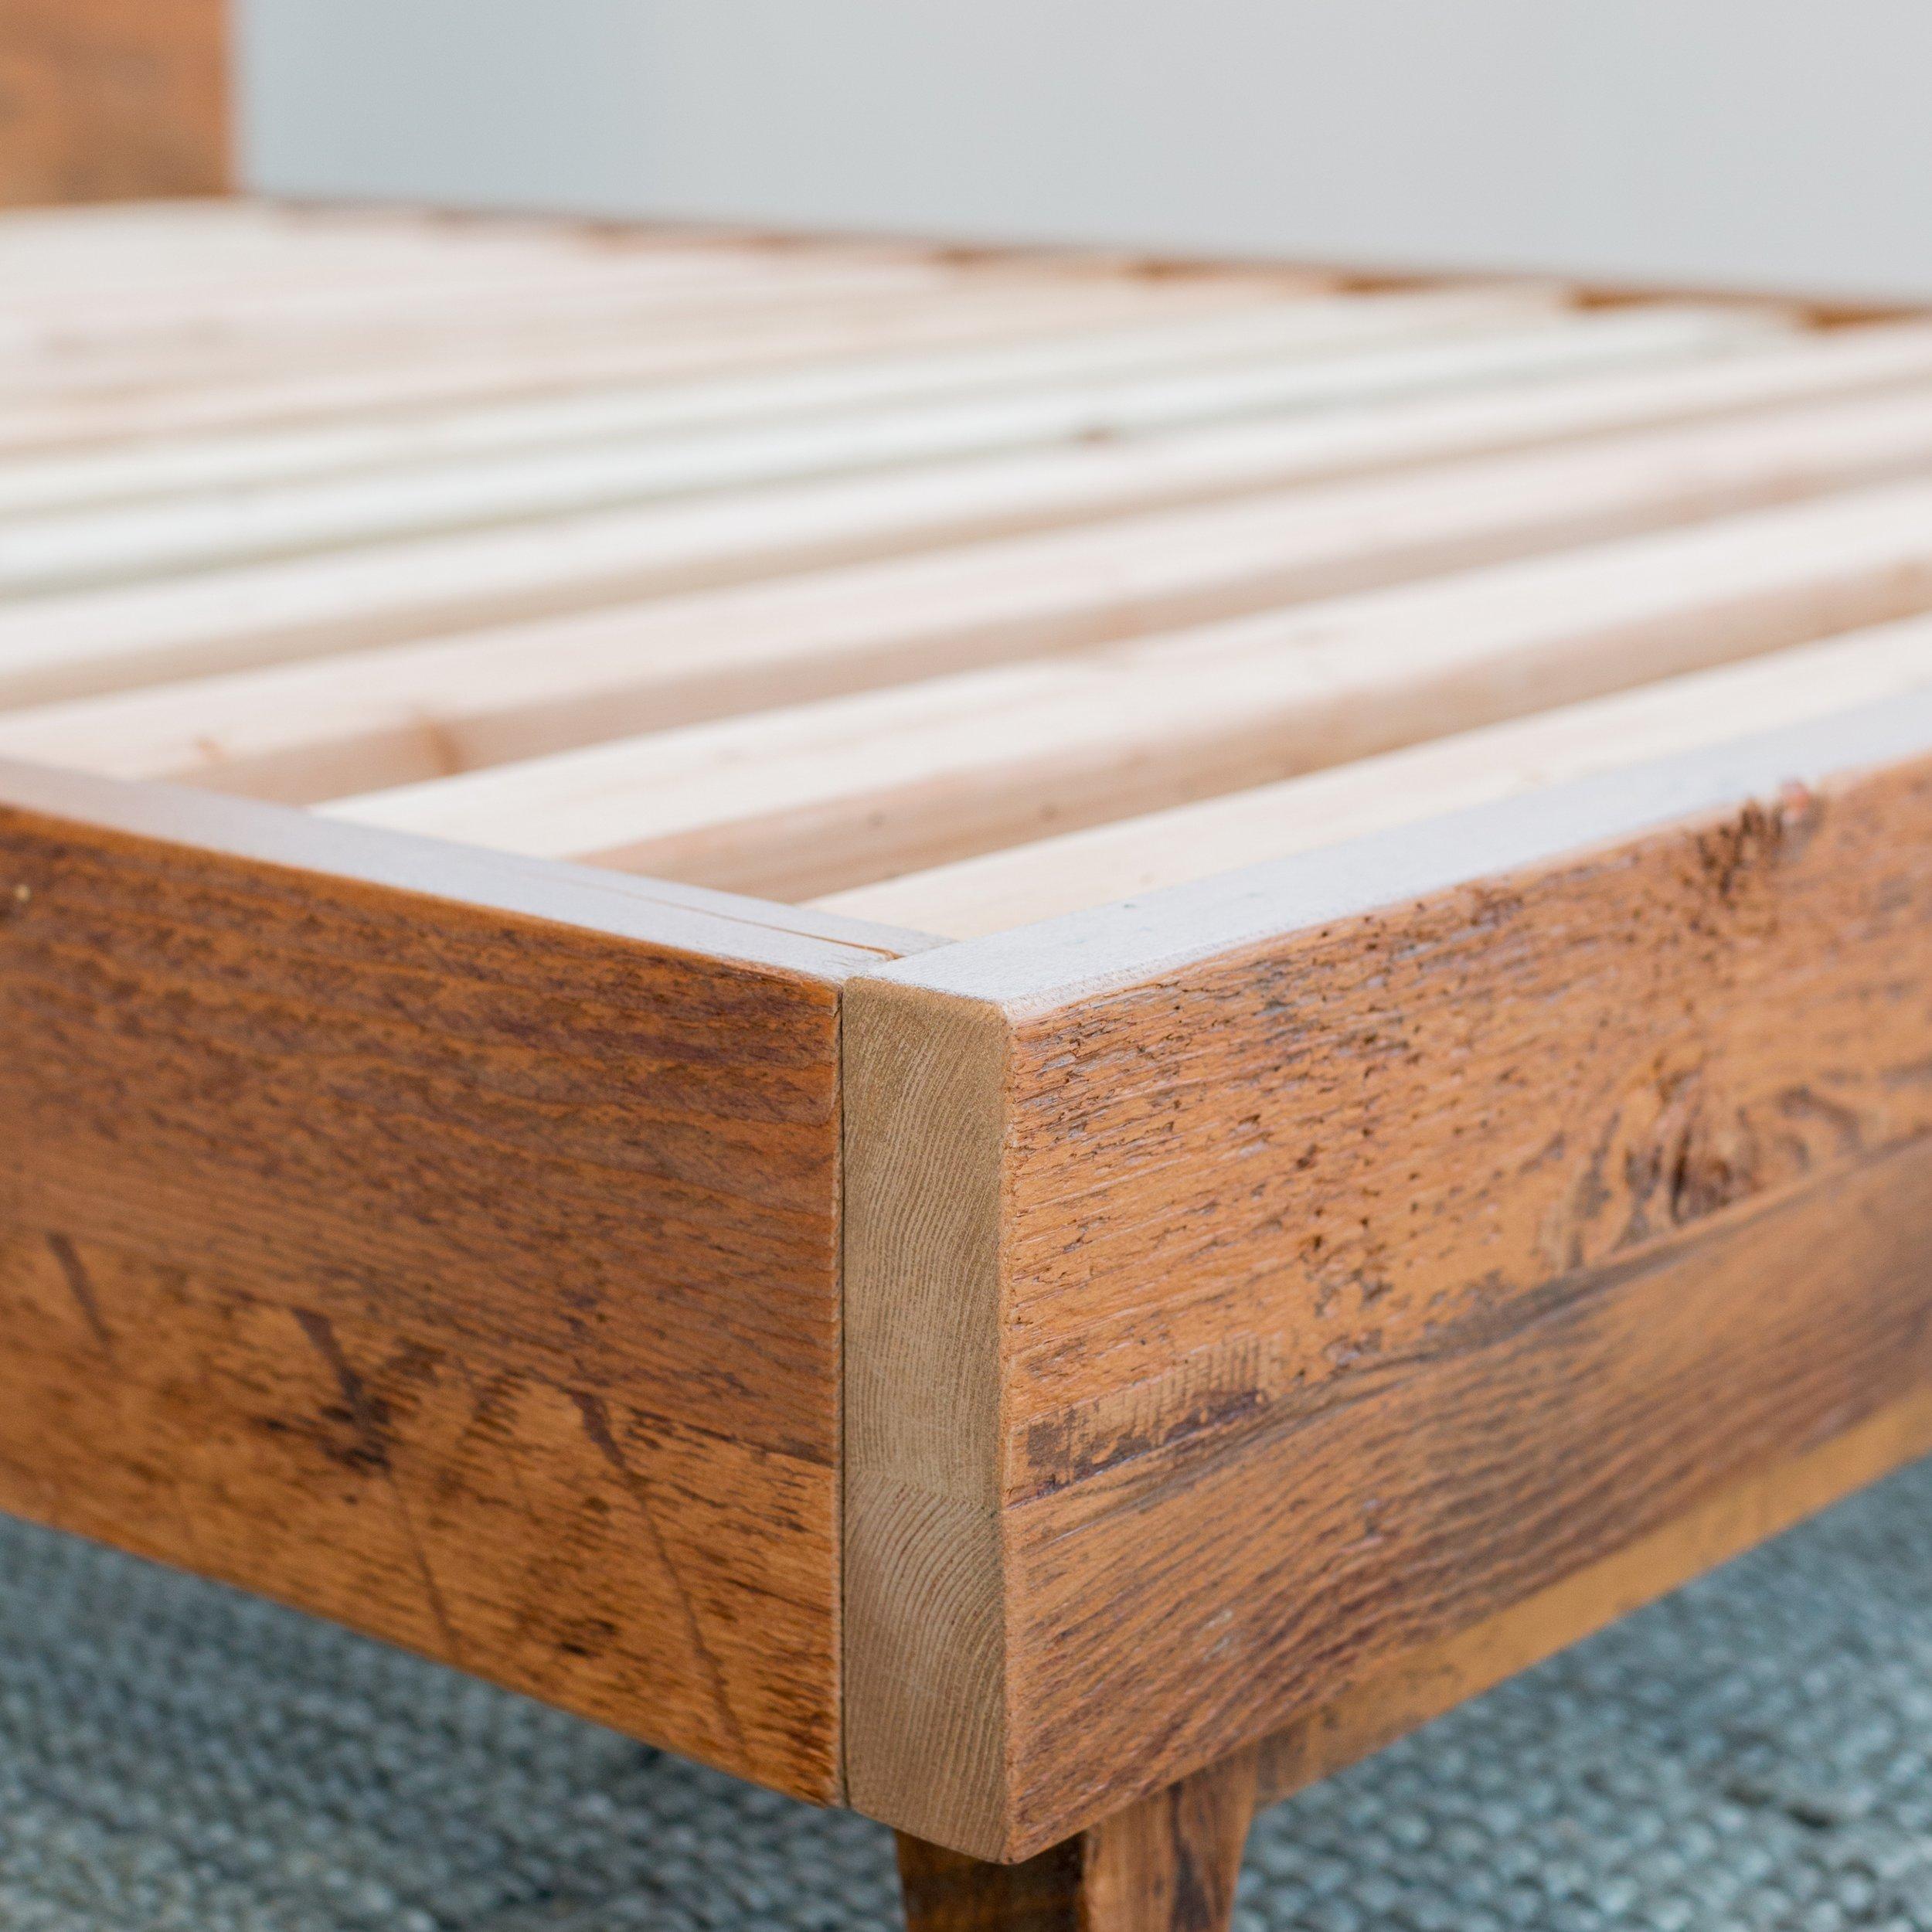 rough wooden furniture